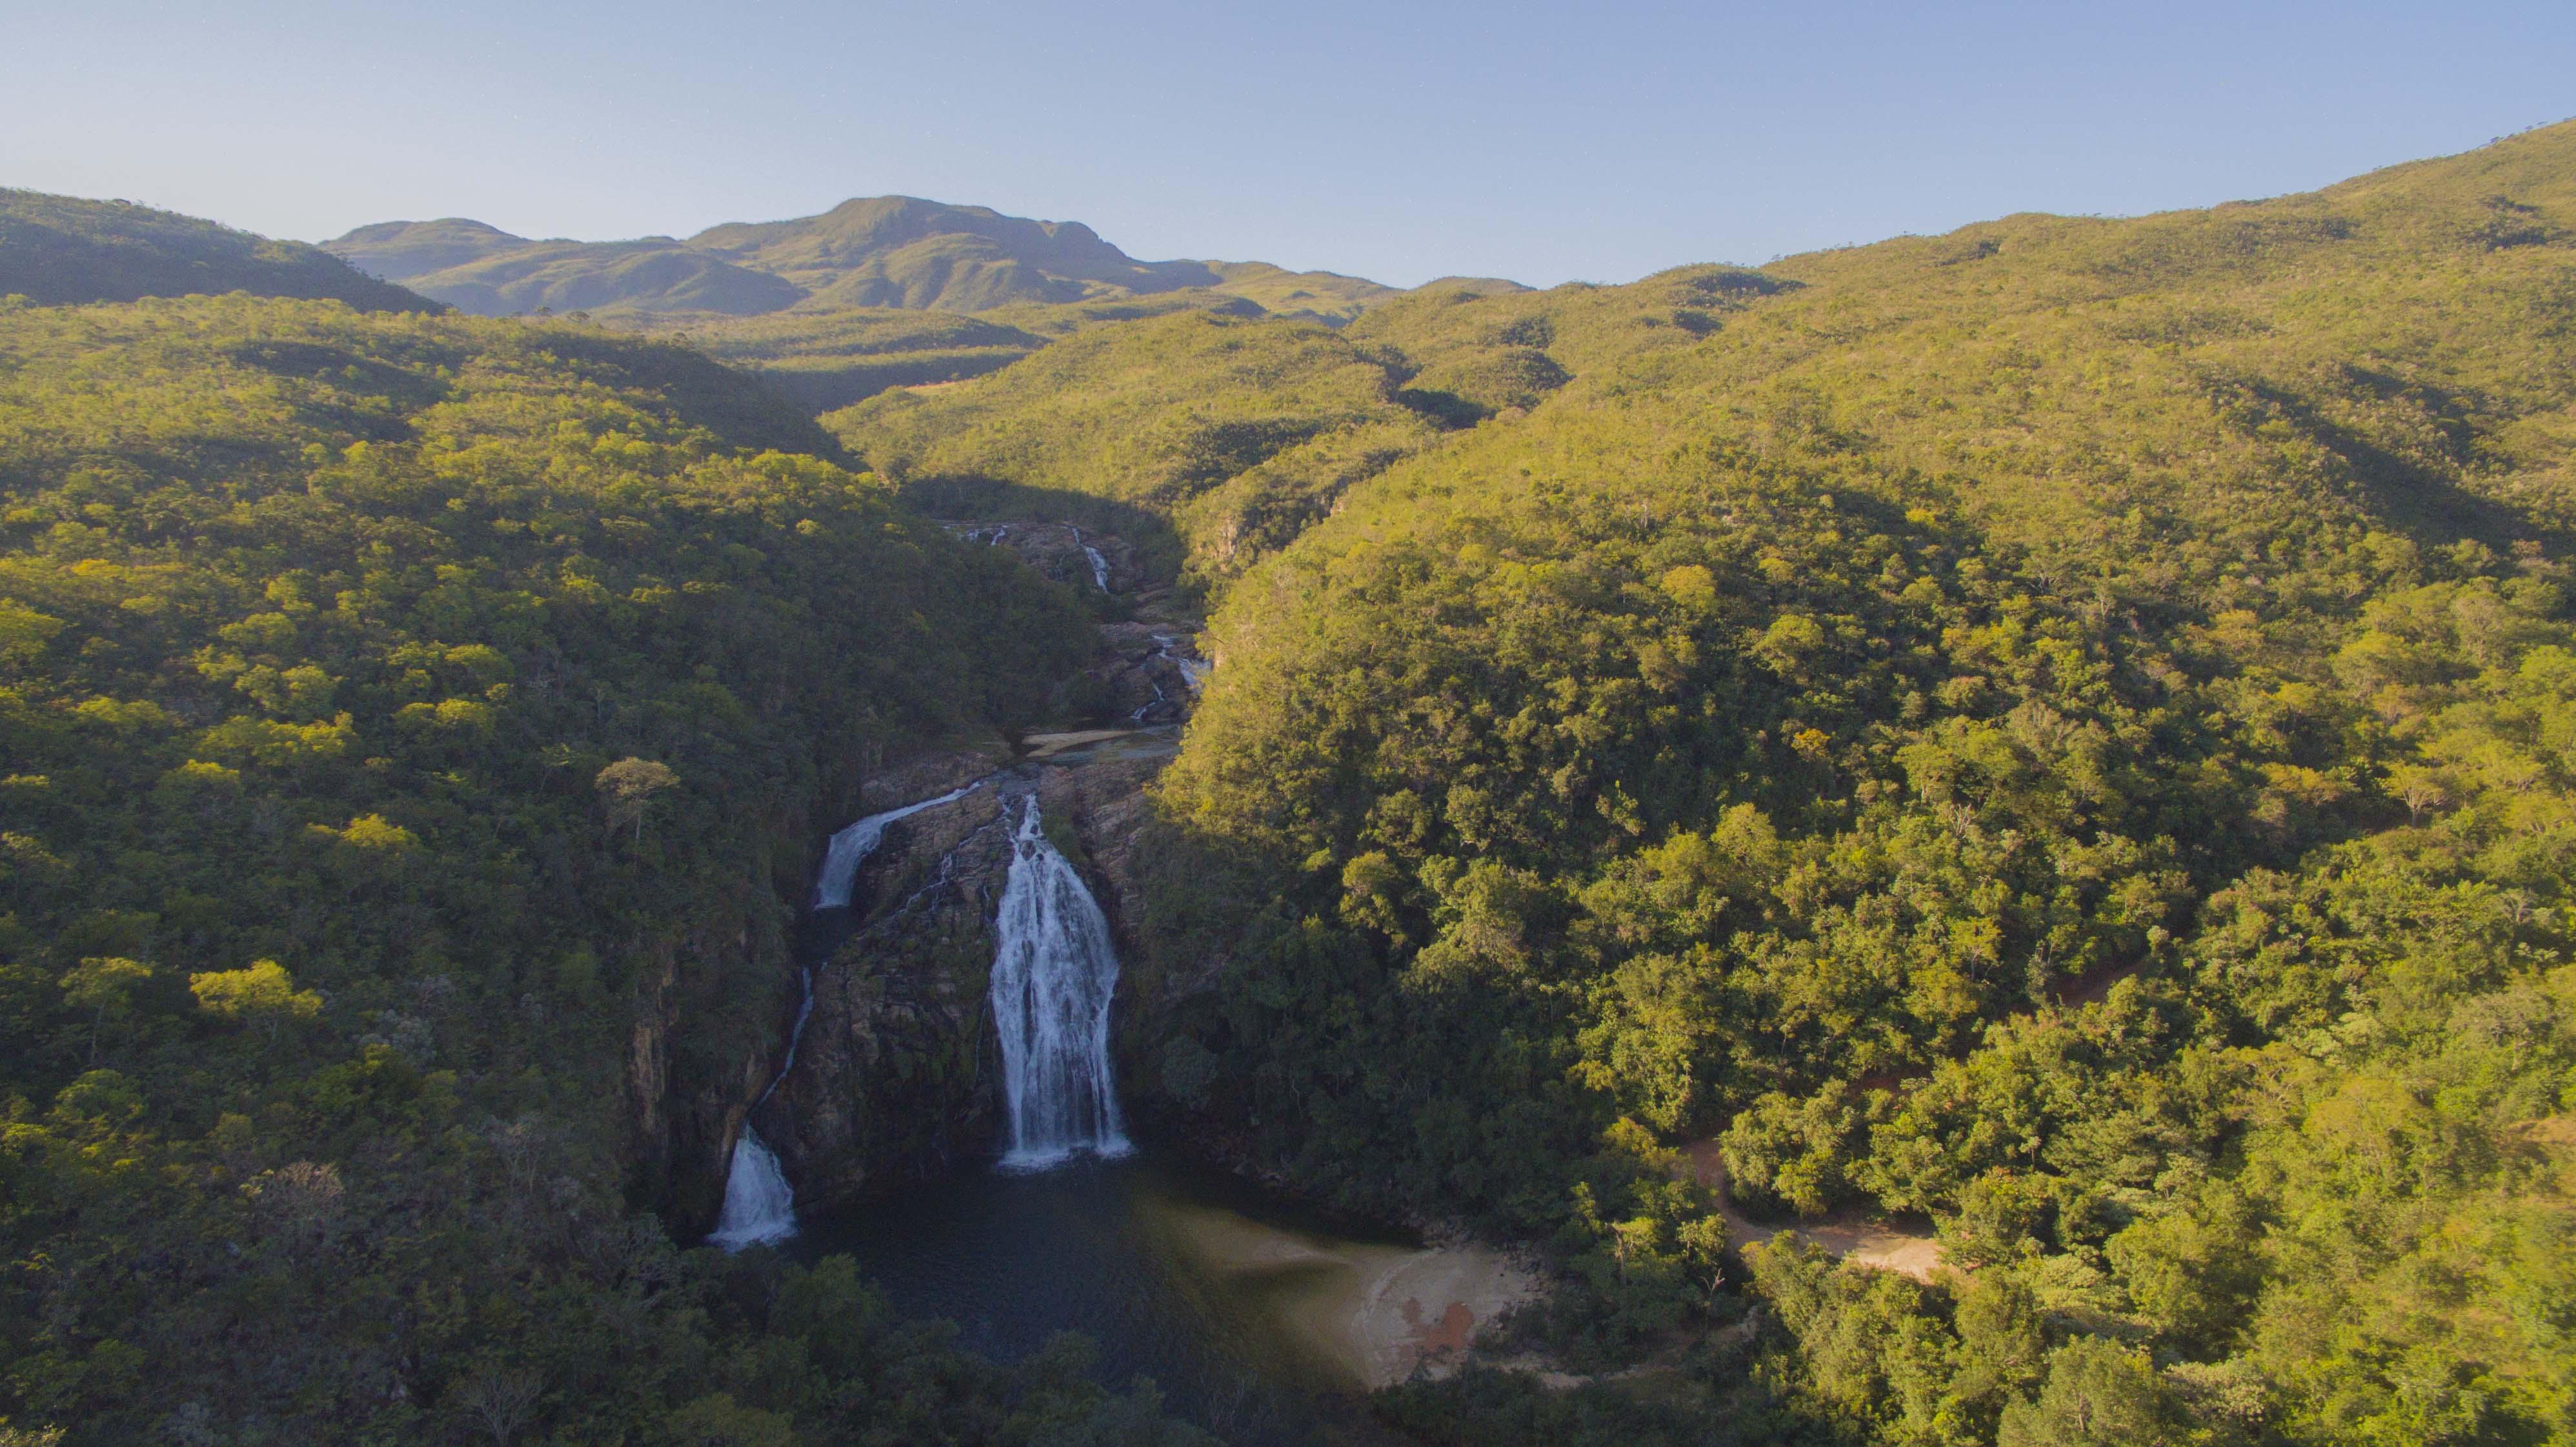 Cachoeira – 360° Experience (Vídeo)